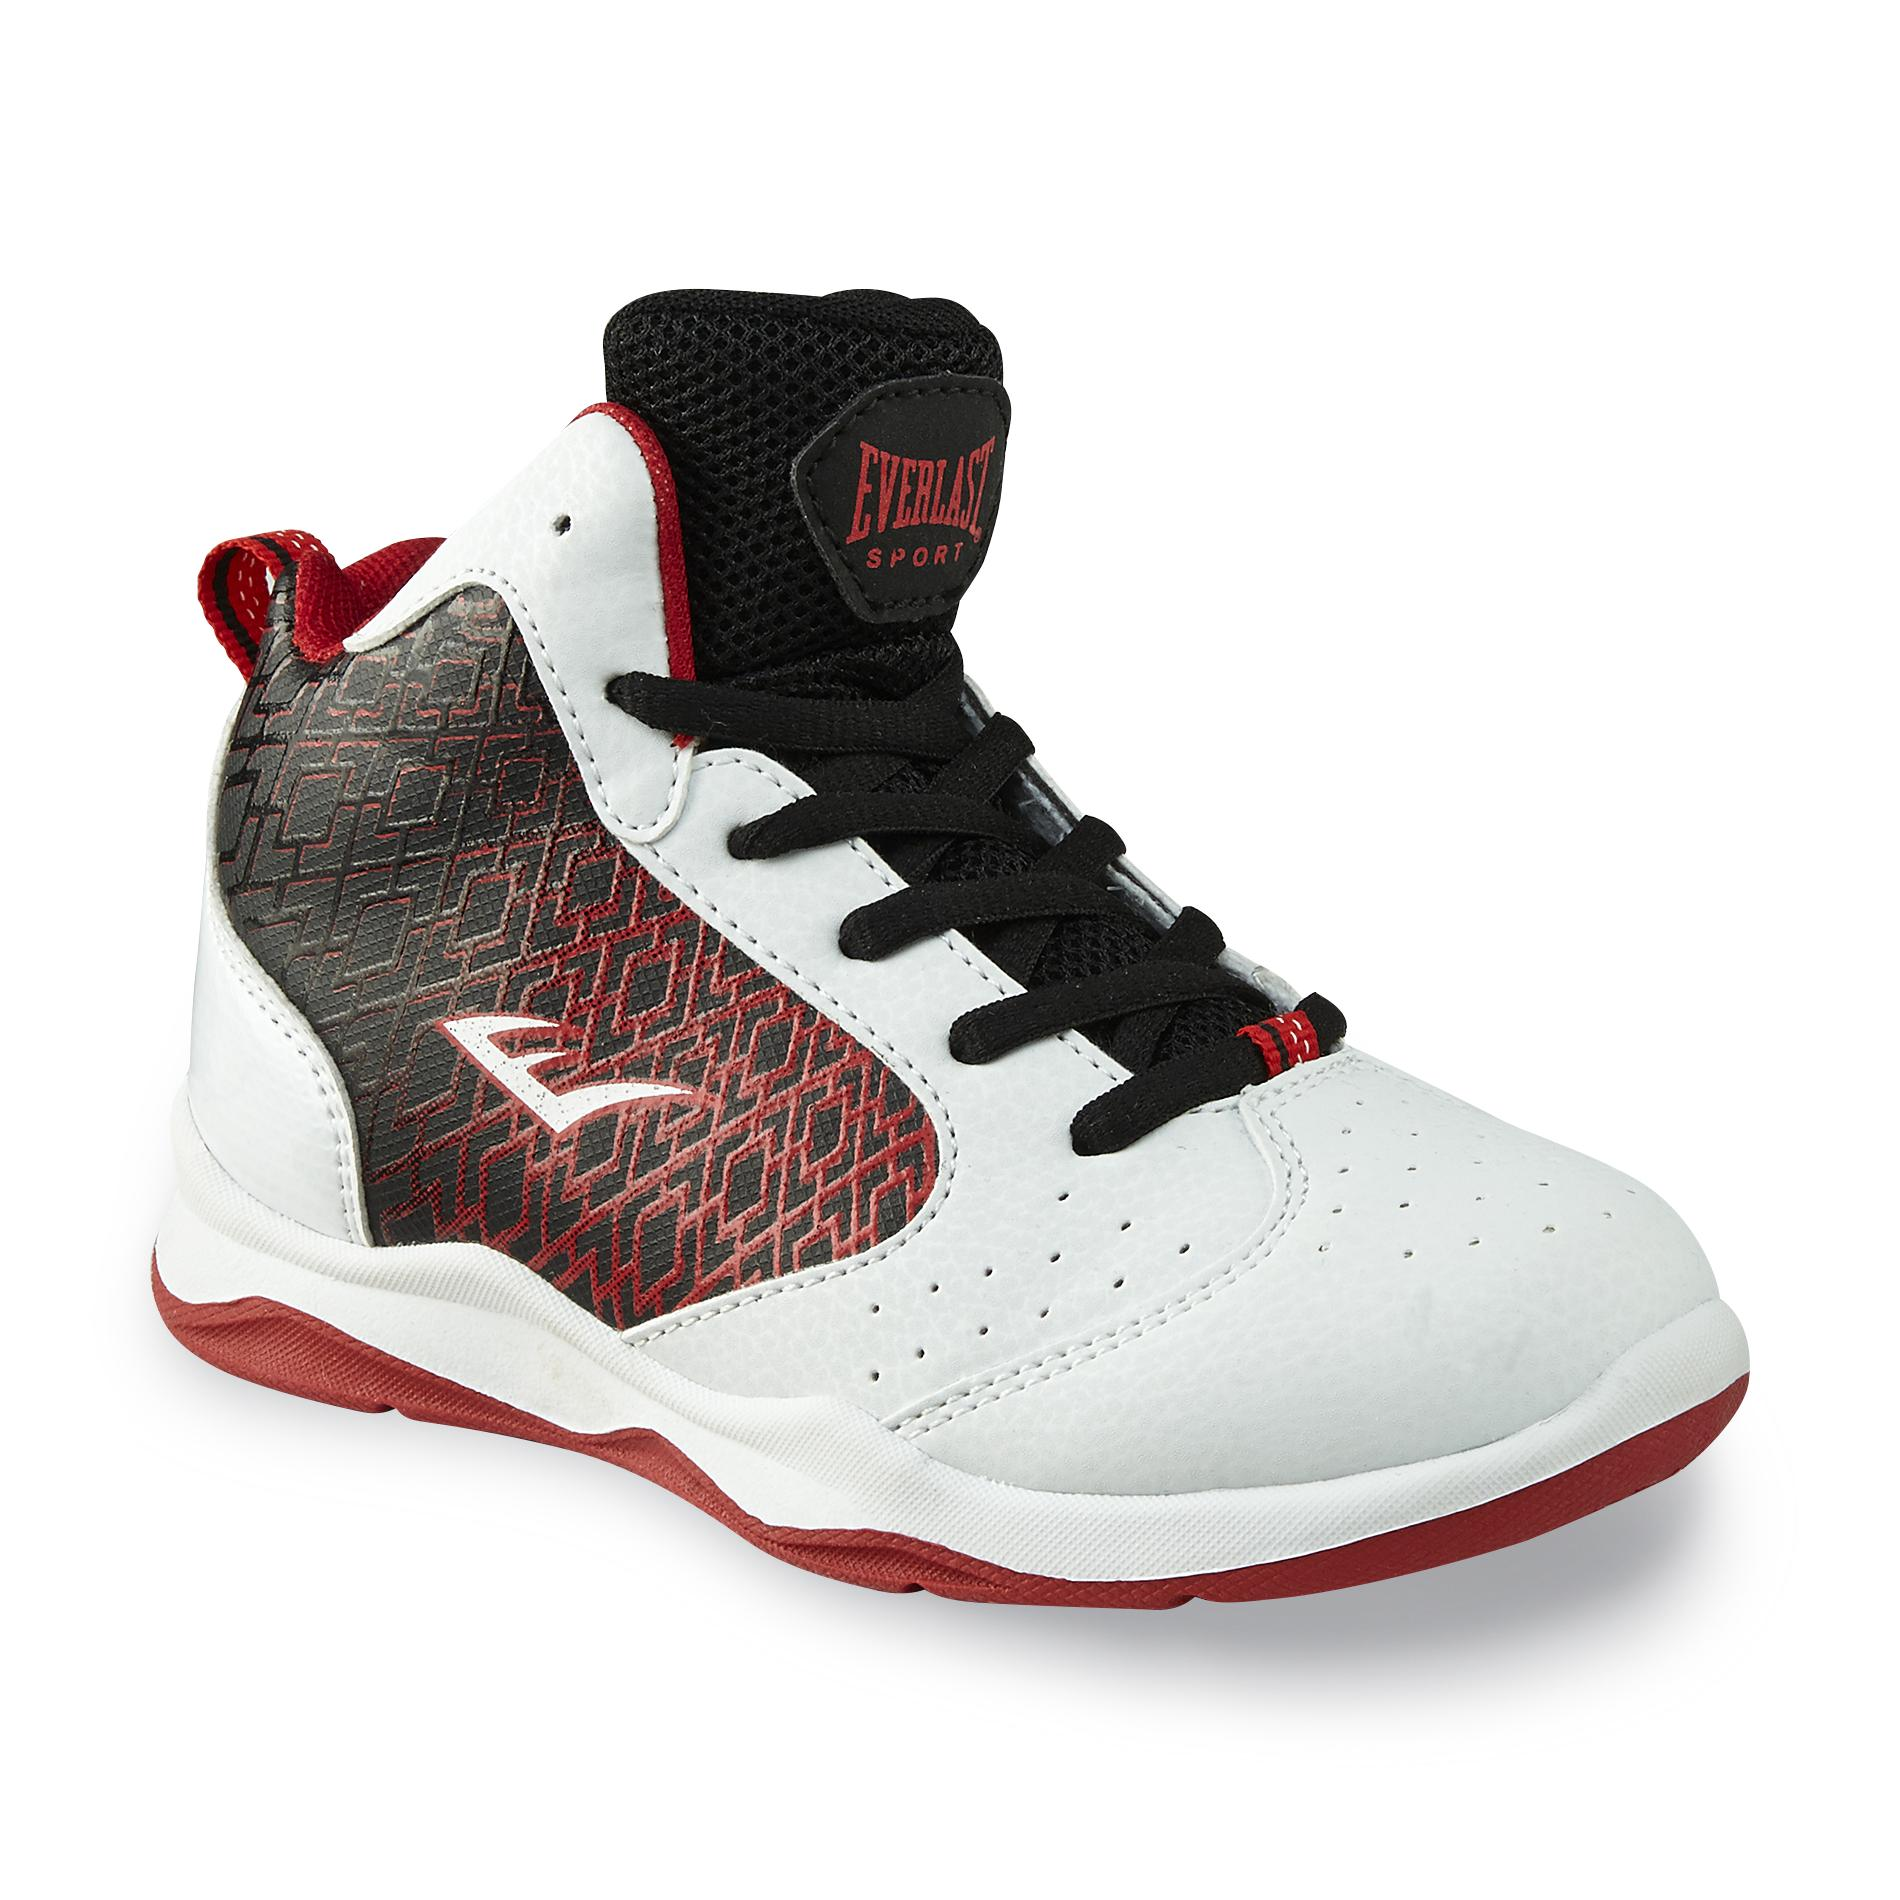 Everlast® Sport Boy's Code White/Black/Red Basketball Shoe PartNumber: 035VA83233412P MfgPartNumber: 81154